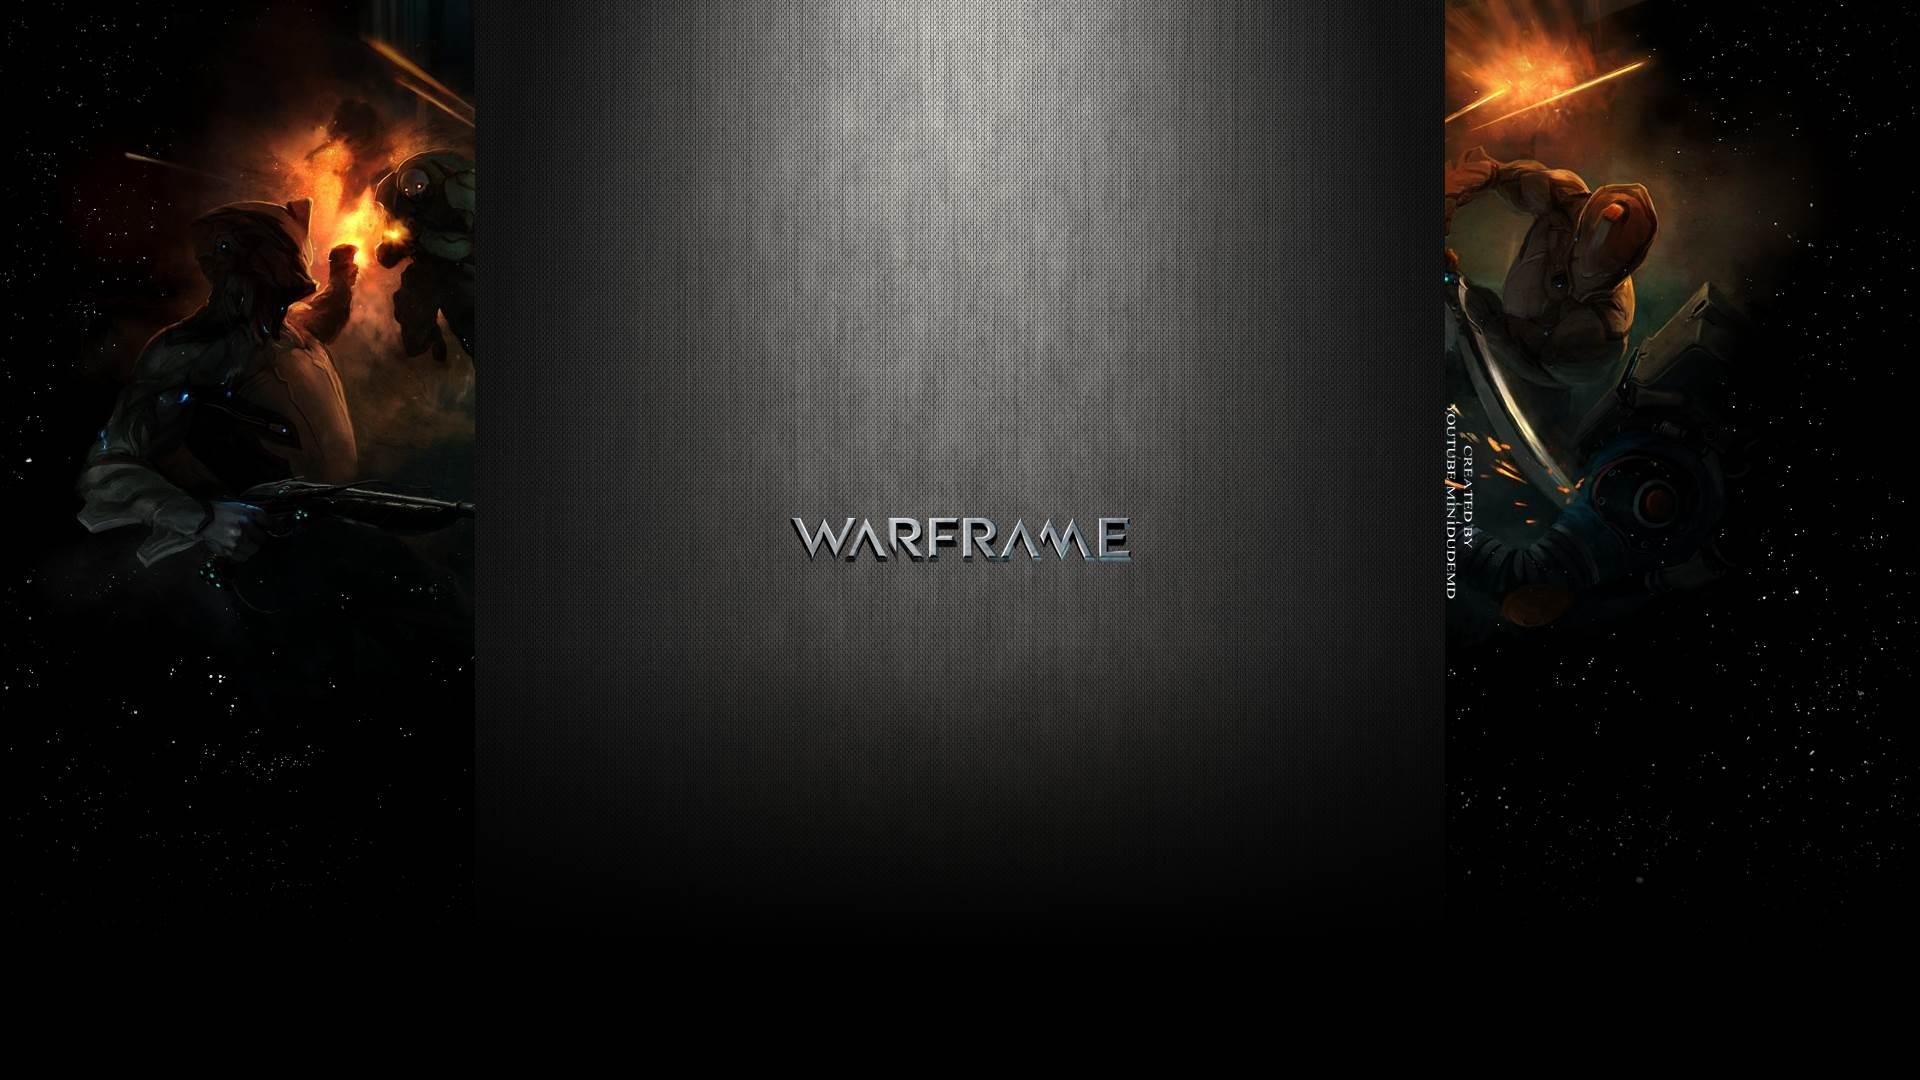 Warframe Wallpaper